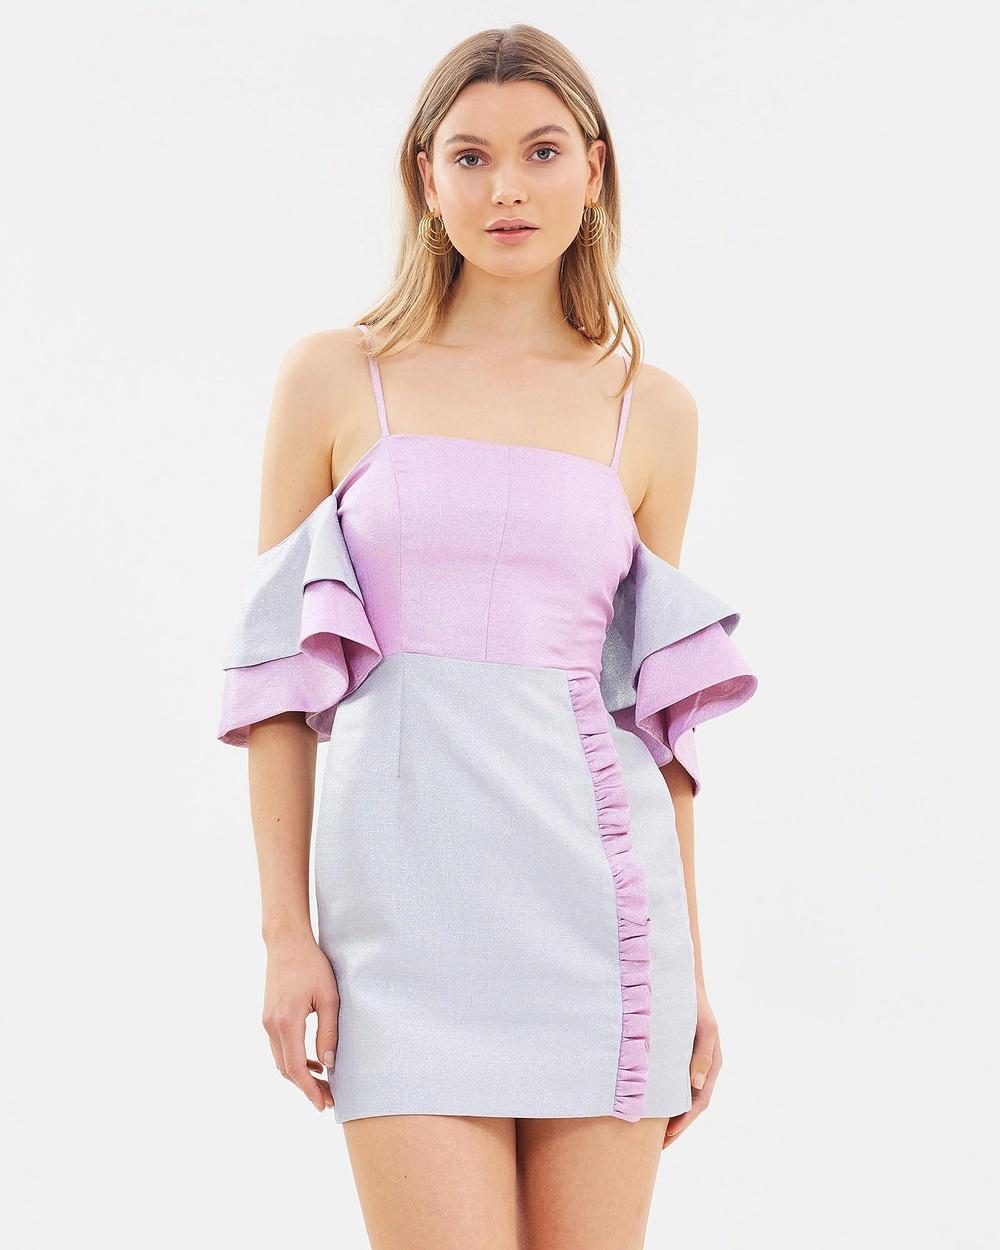 DELPHINE Pink & Grey It's All Mine Dress